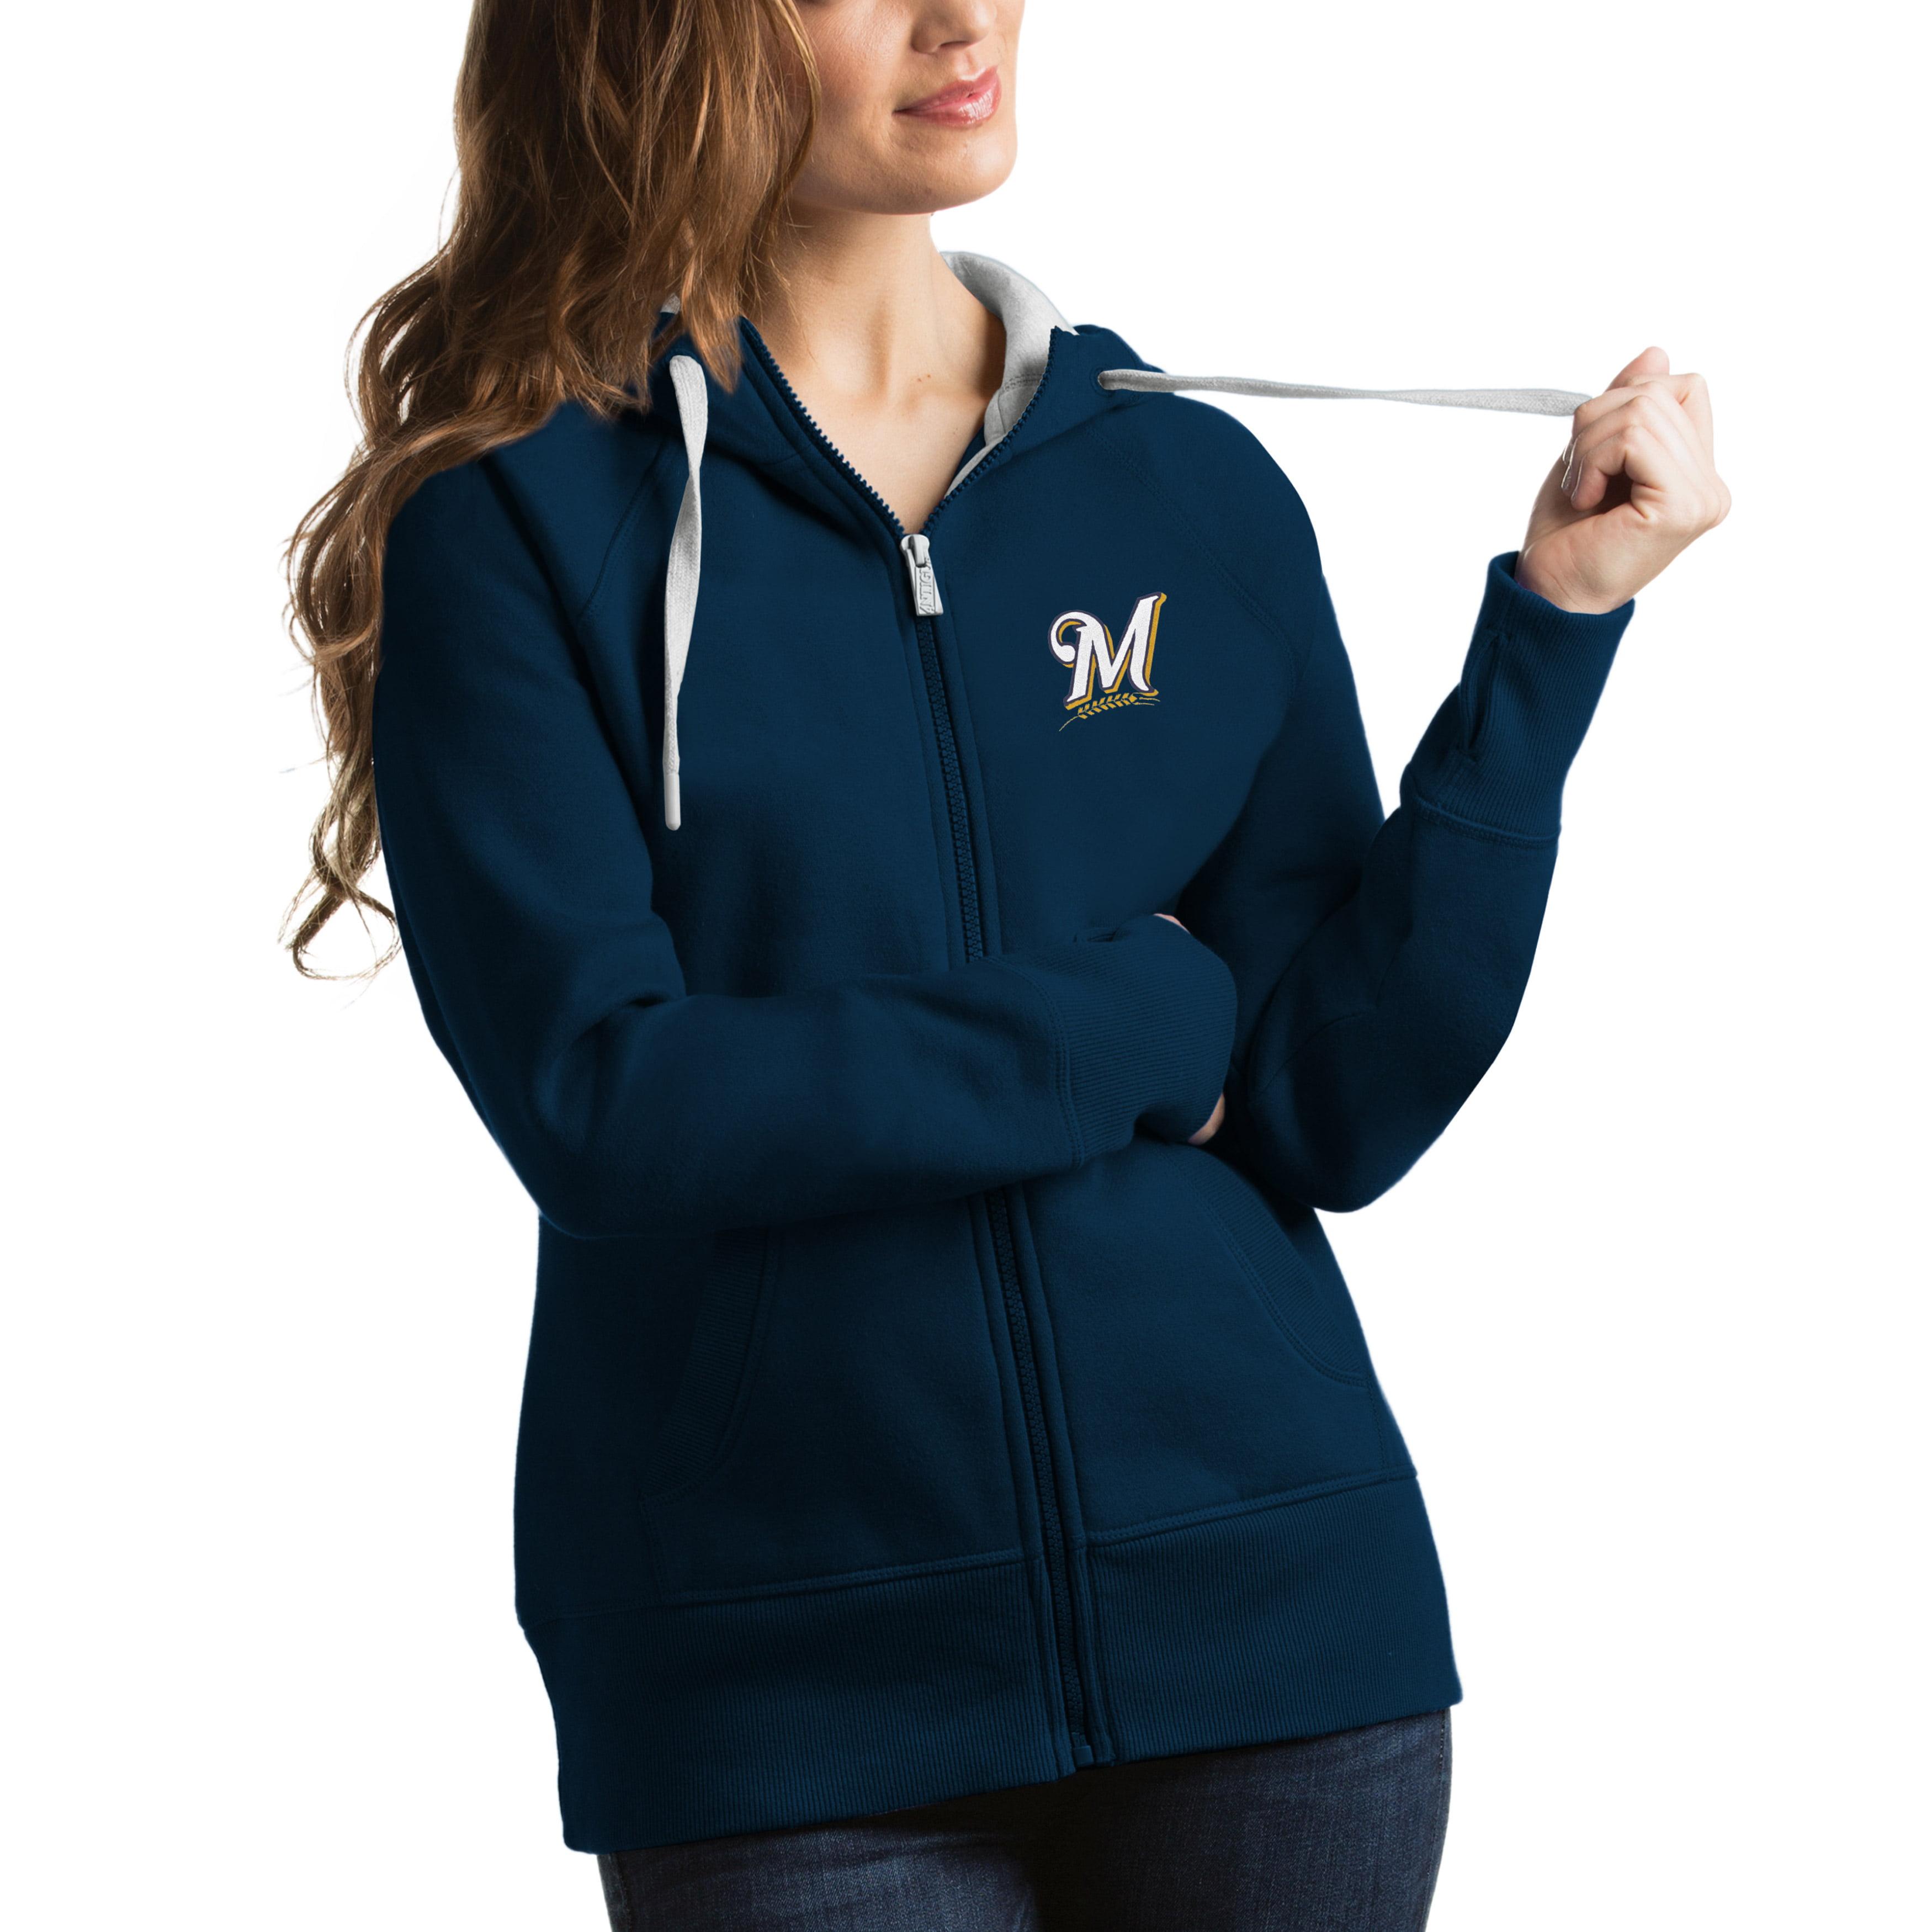 Milwaukee Brewers Antigua Women's Victory Full-Zip Hoodie - Navy